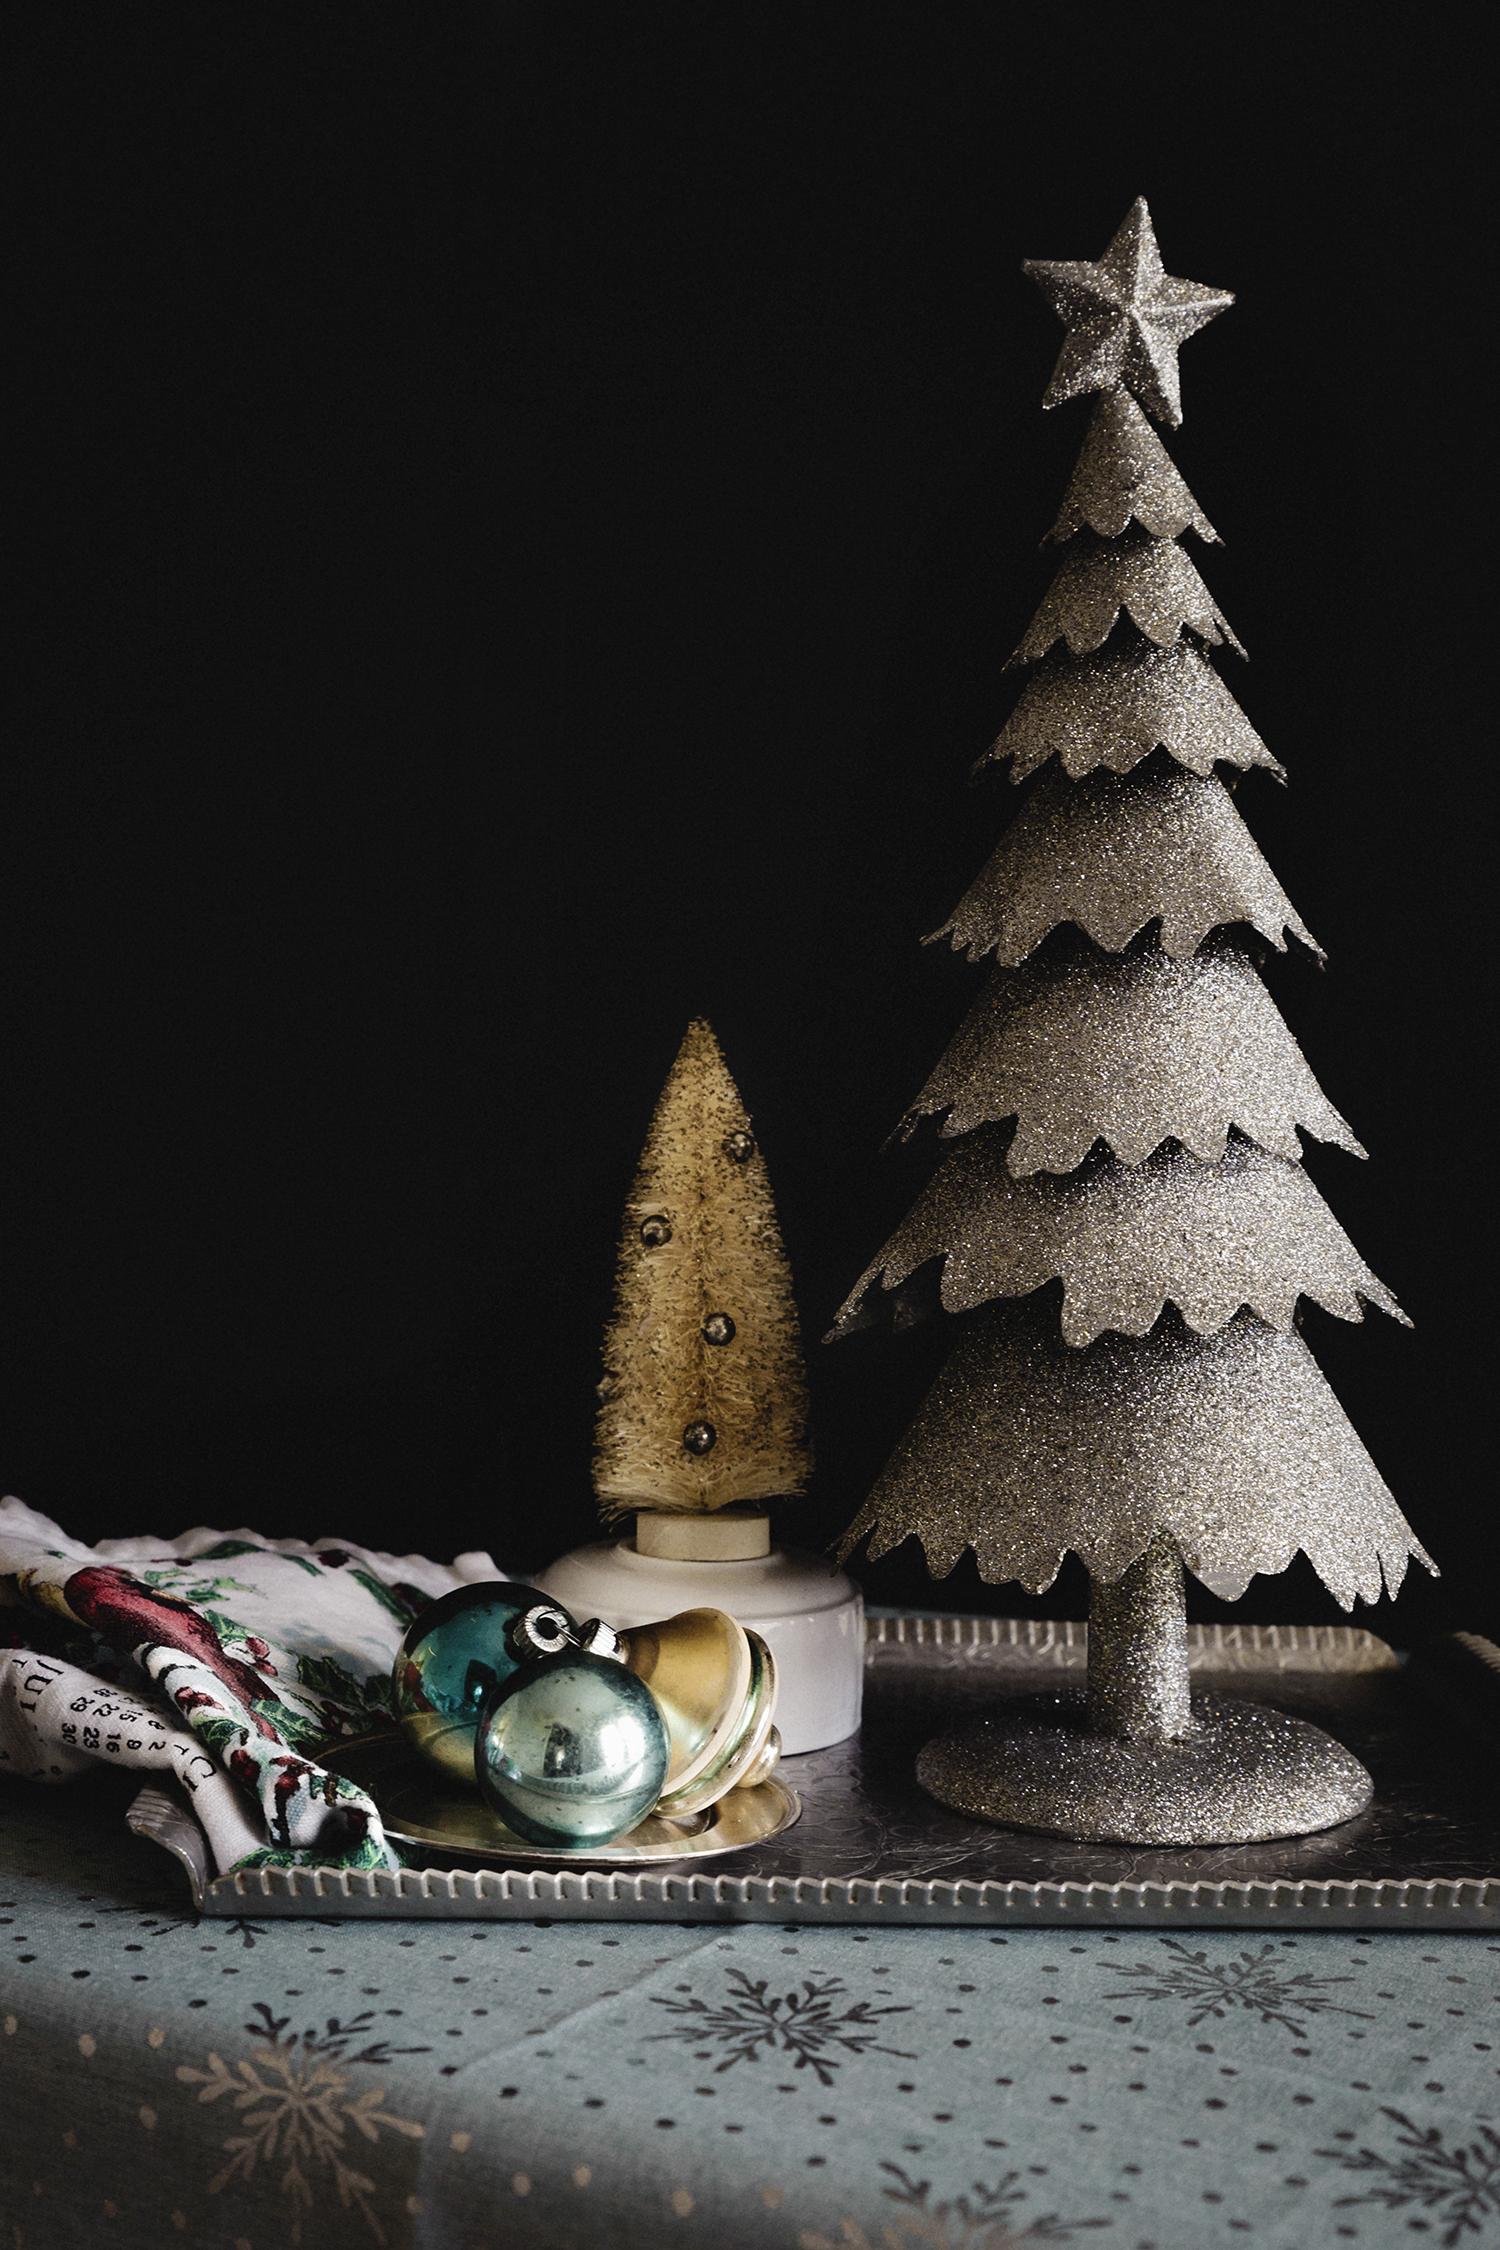 Christmas_DutchMasters_0009.jpg